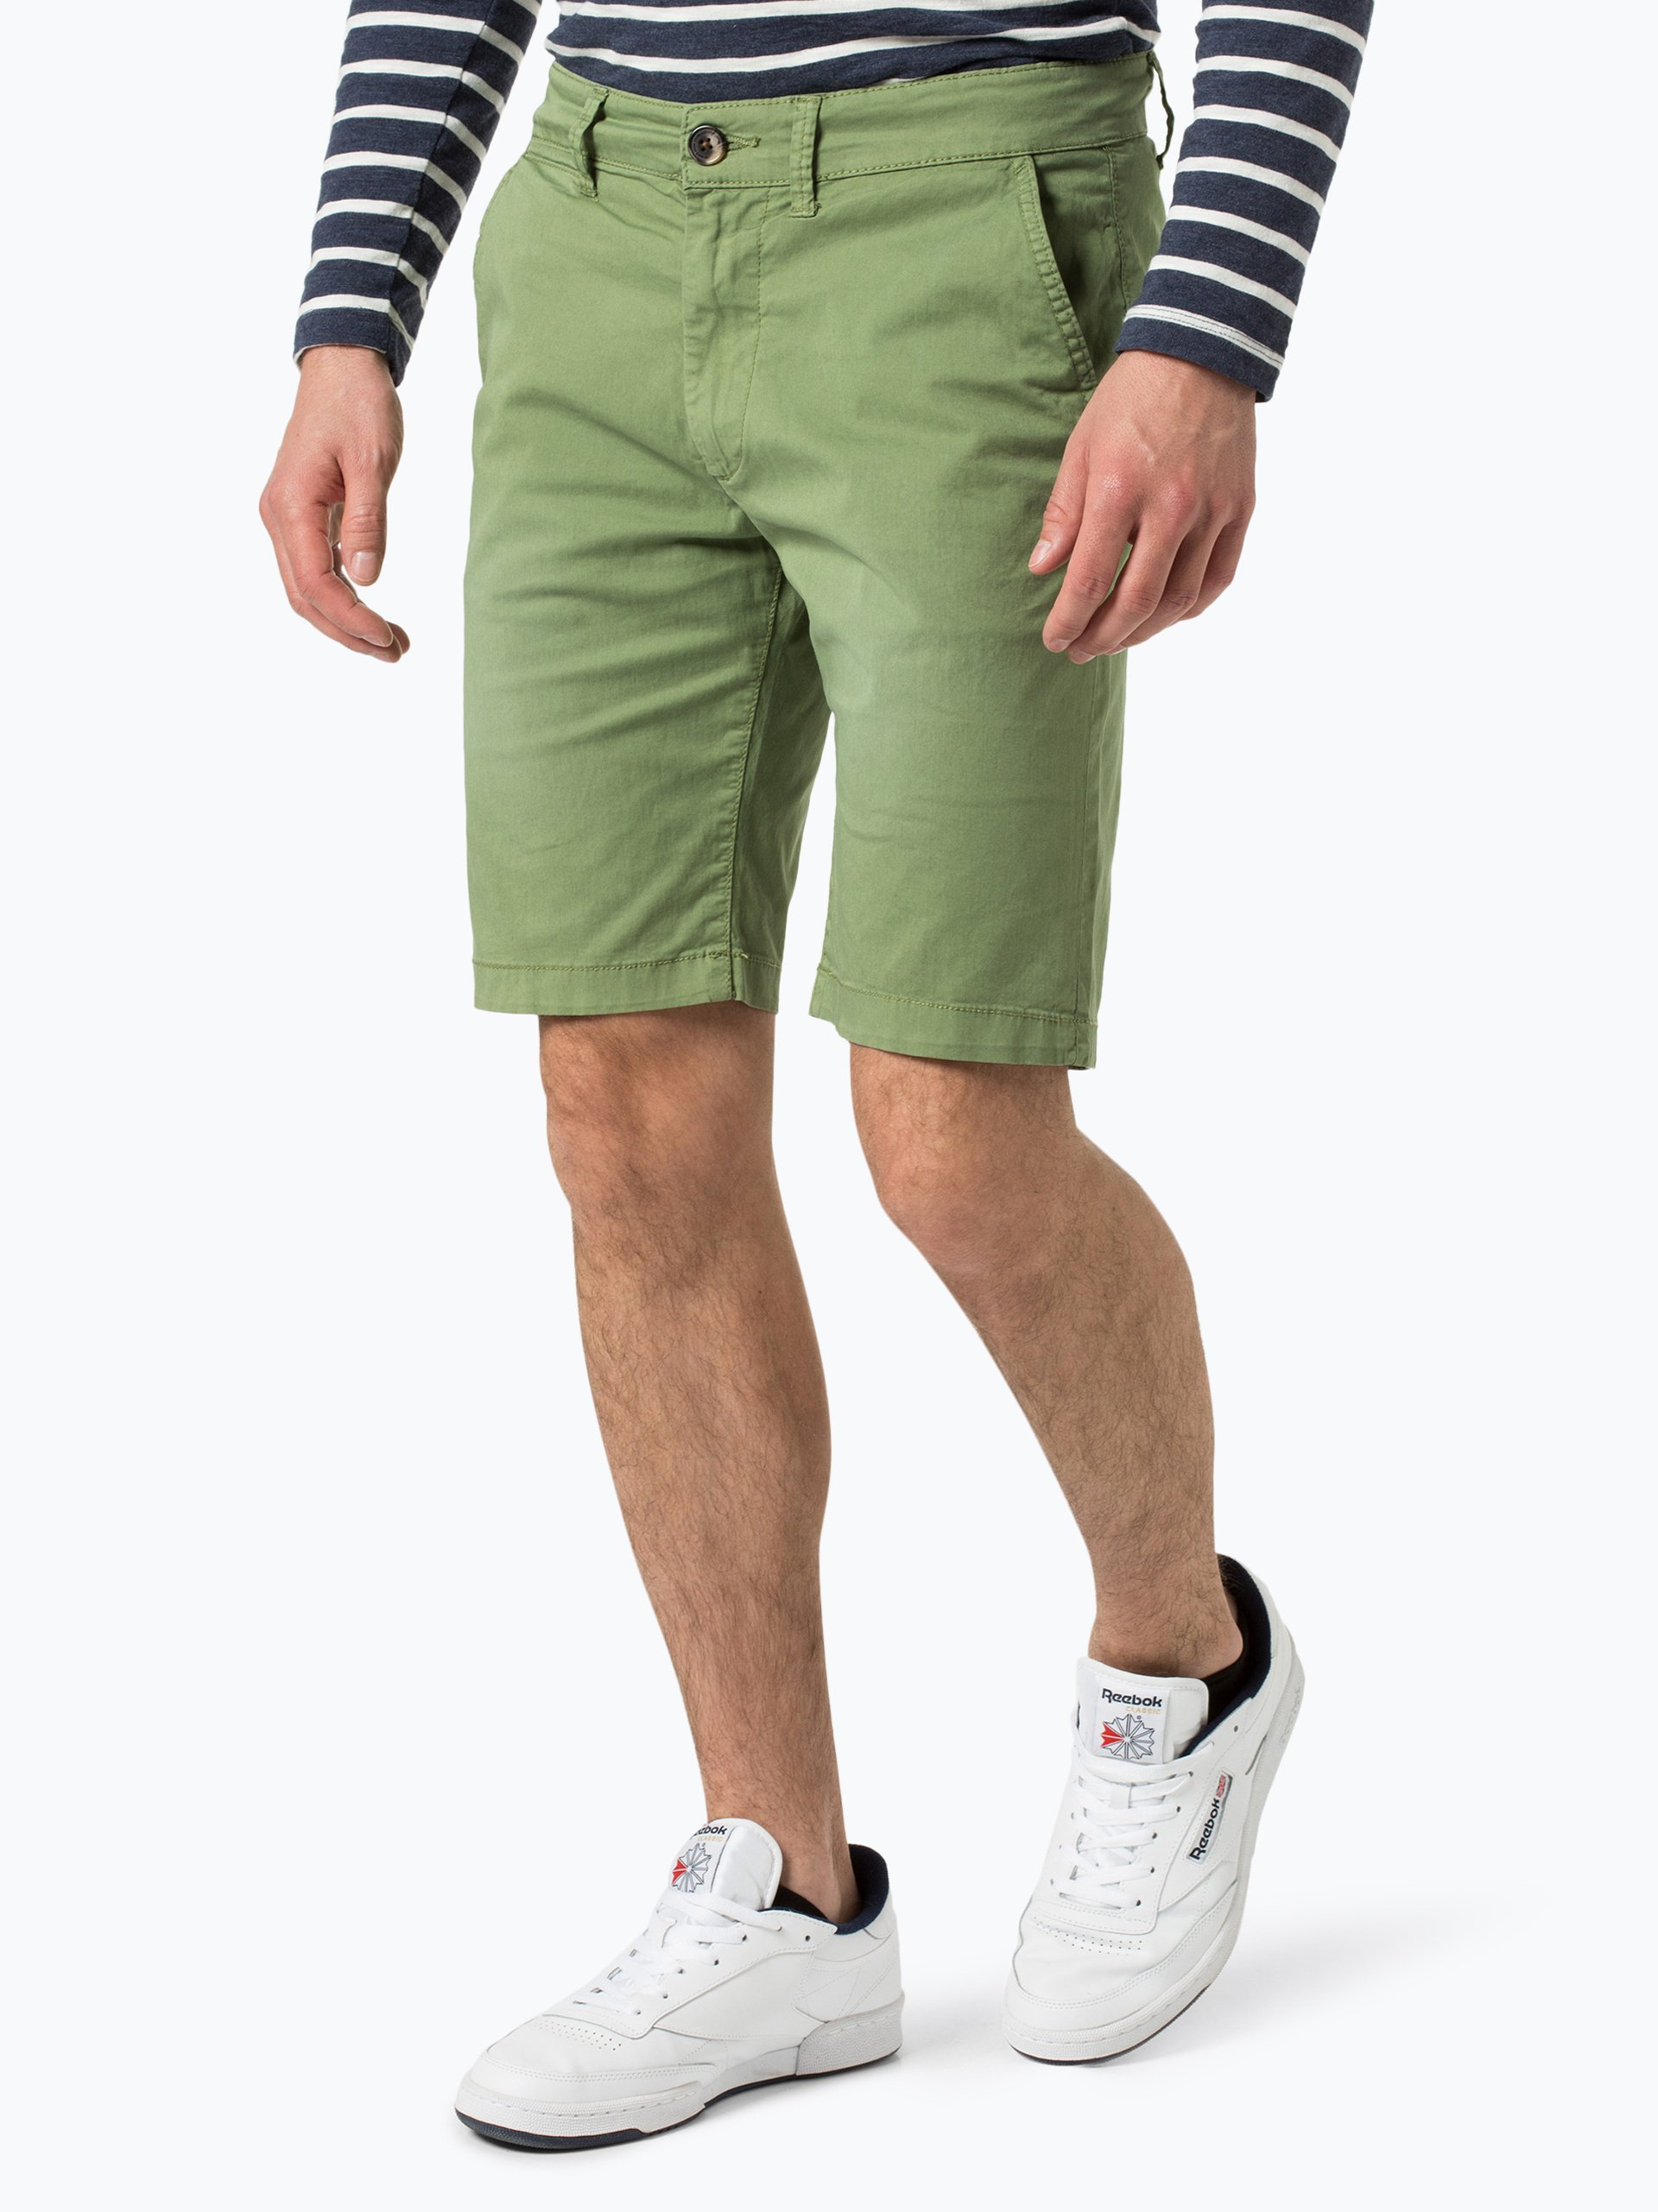 pepe jeans herren shorts mc queen kiwi uni online kaufen peek und cloppenburg de. Black Bedroom Furniture Sets. Home Design Ideas